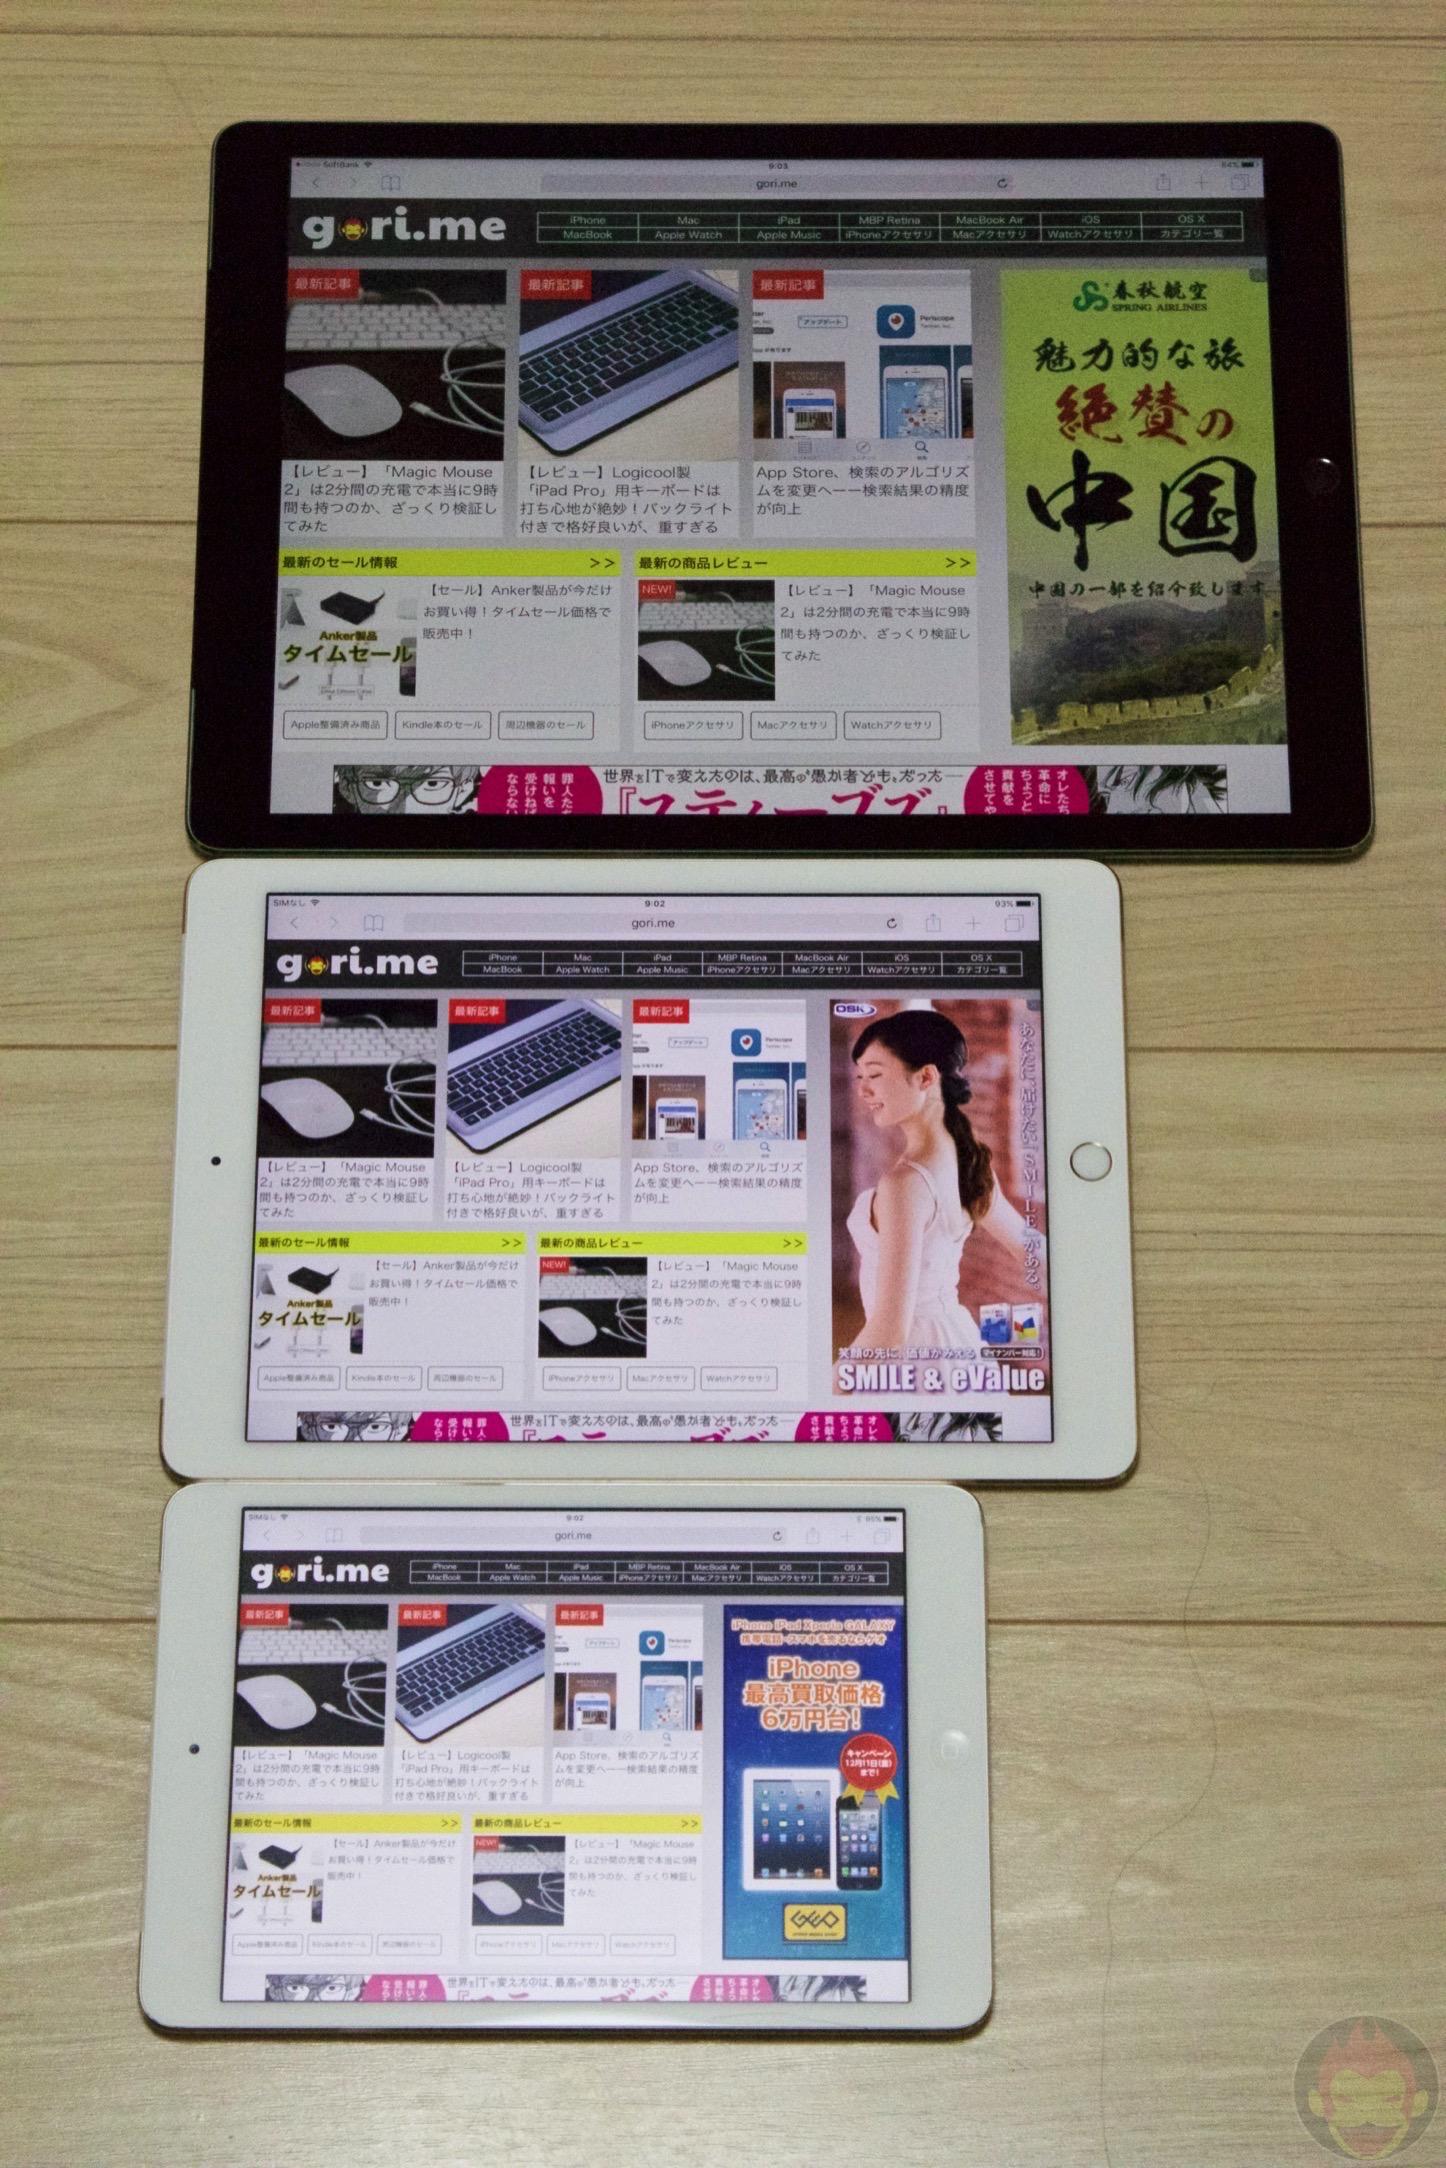 iPad-Pro-Air2-mini2-Comparison-03.jpg